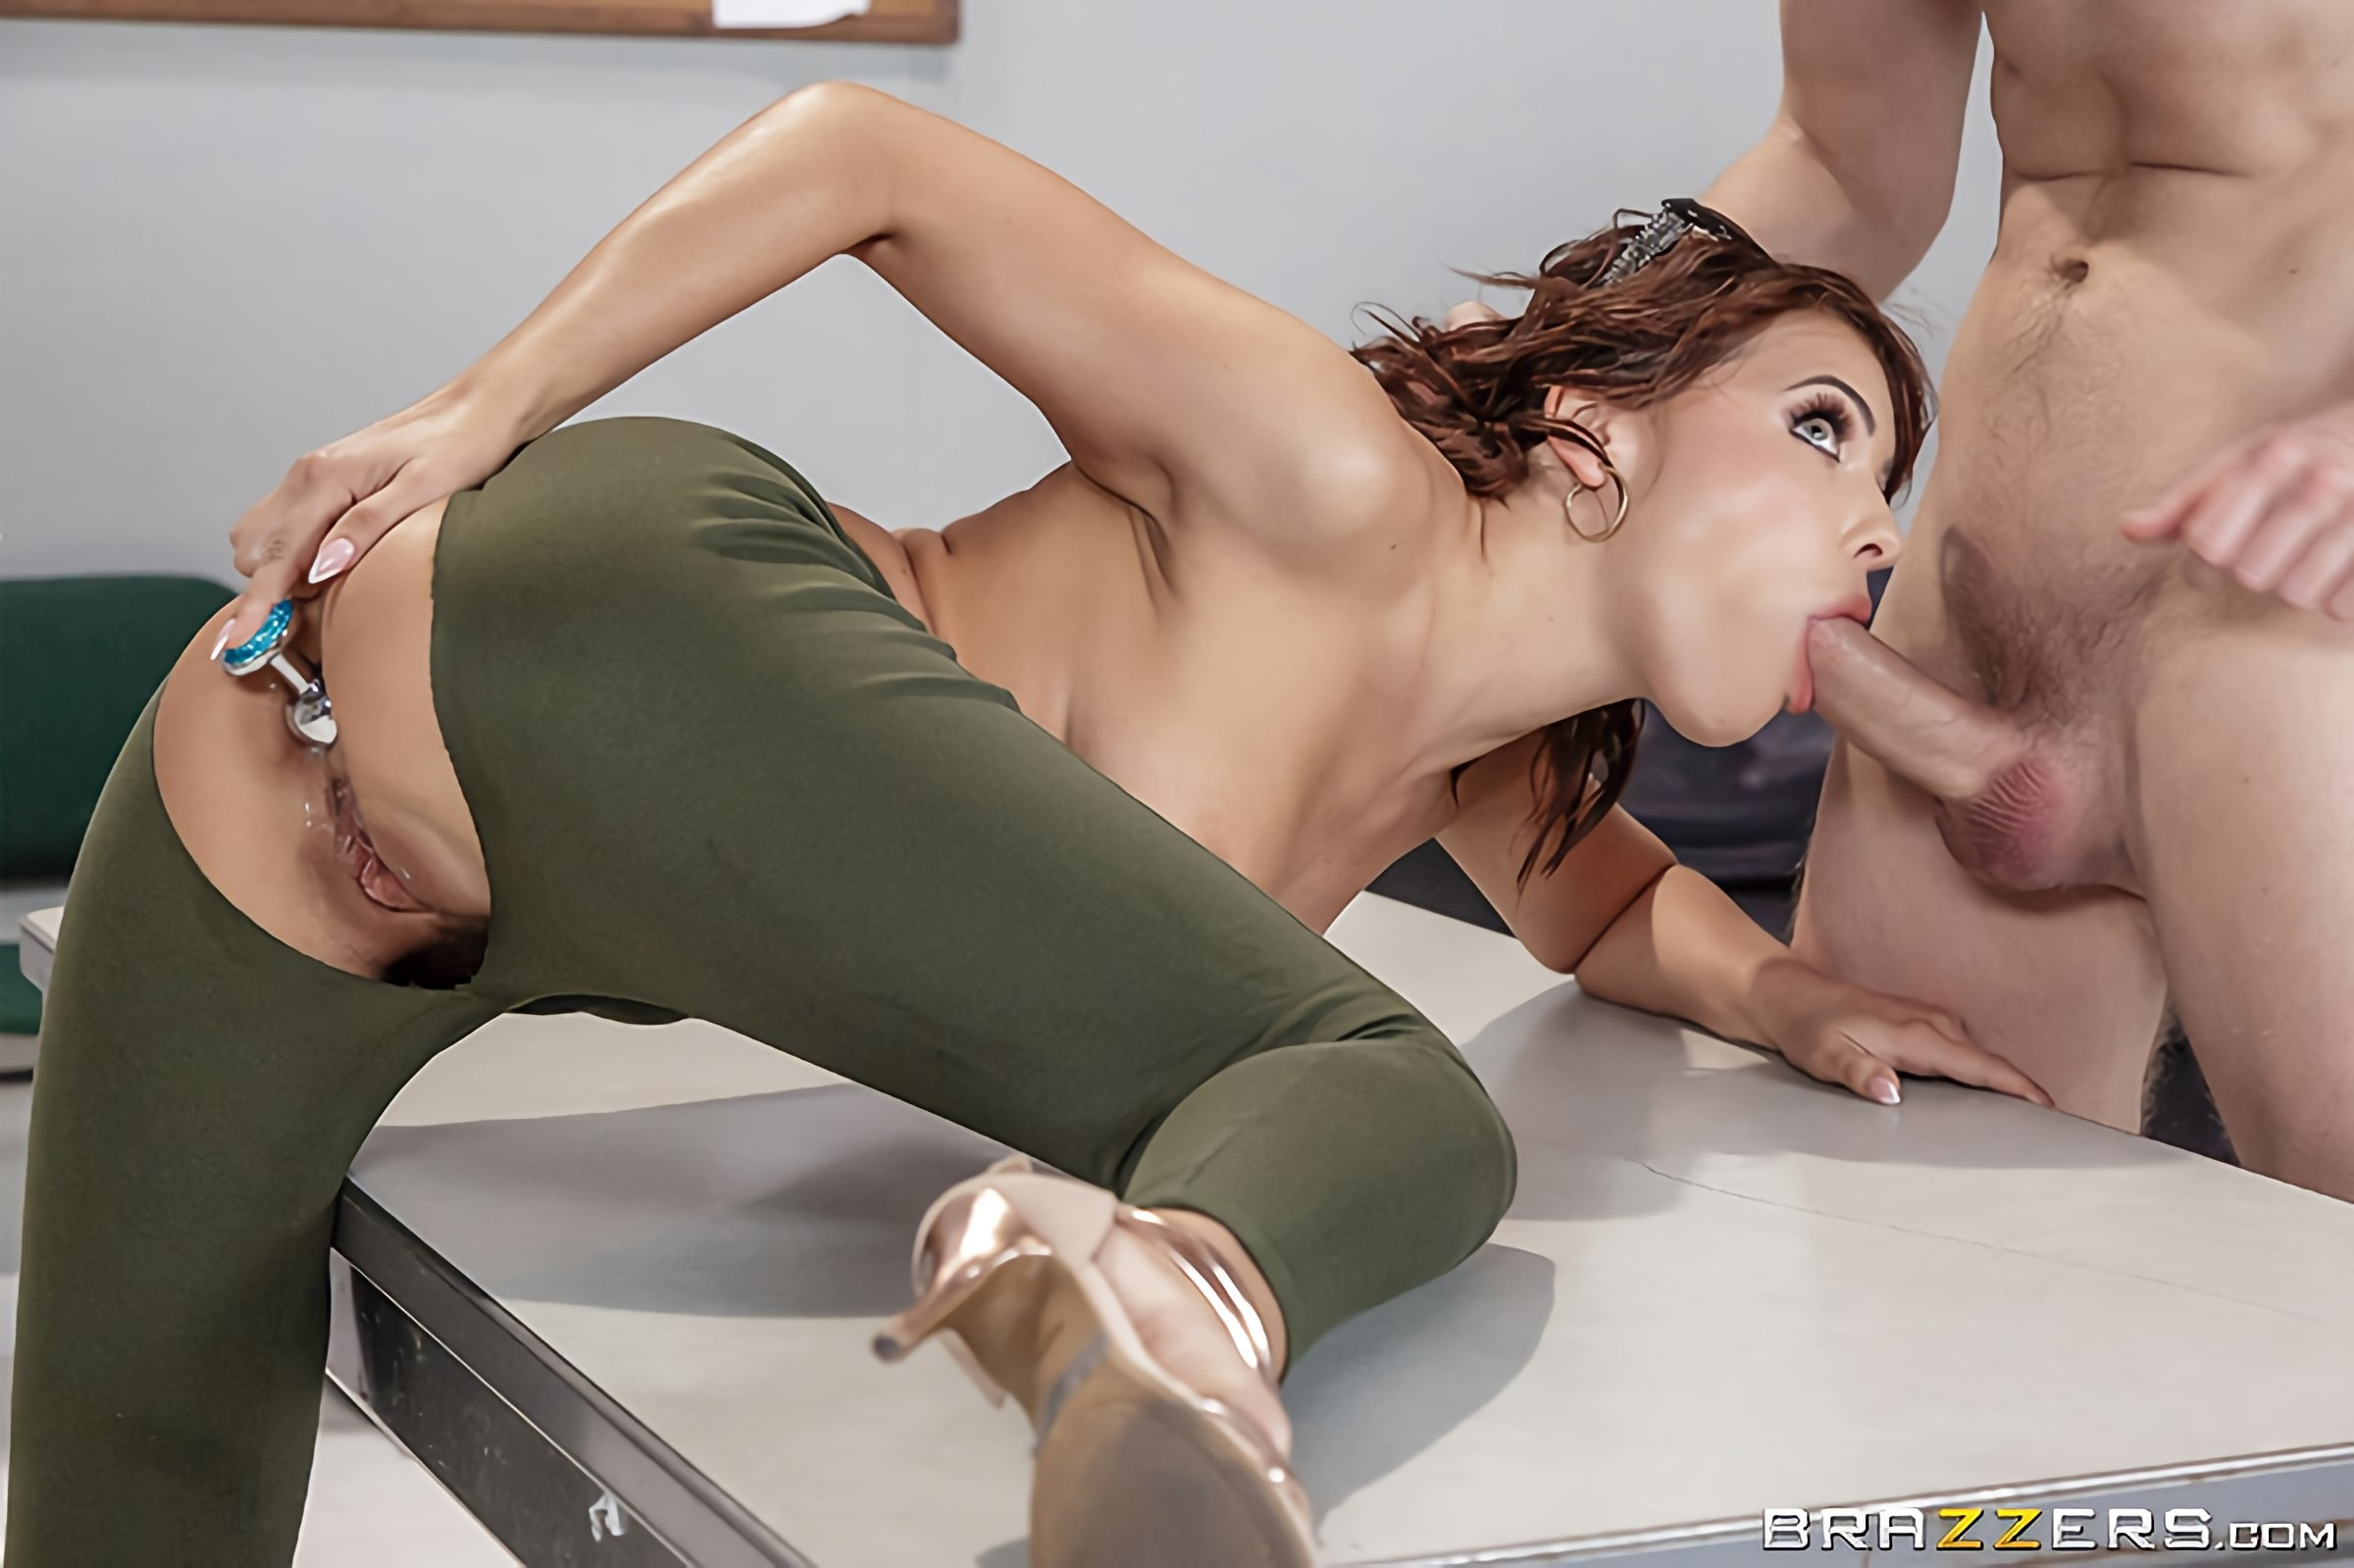 Teen amateur nude girl